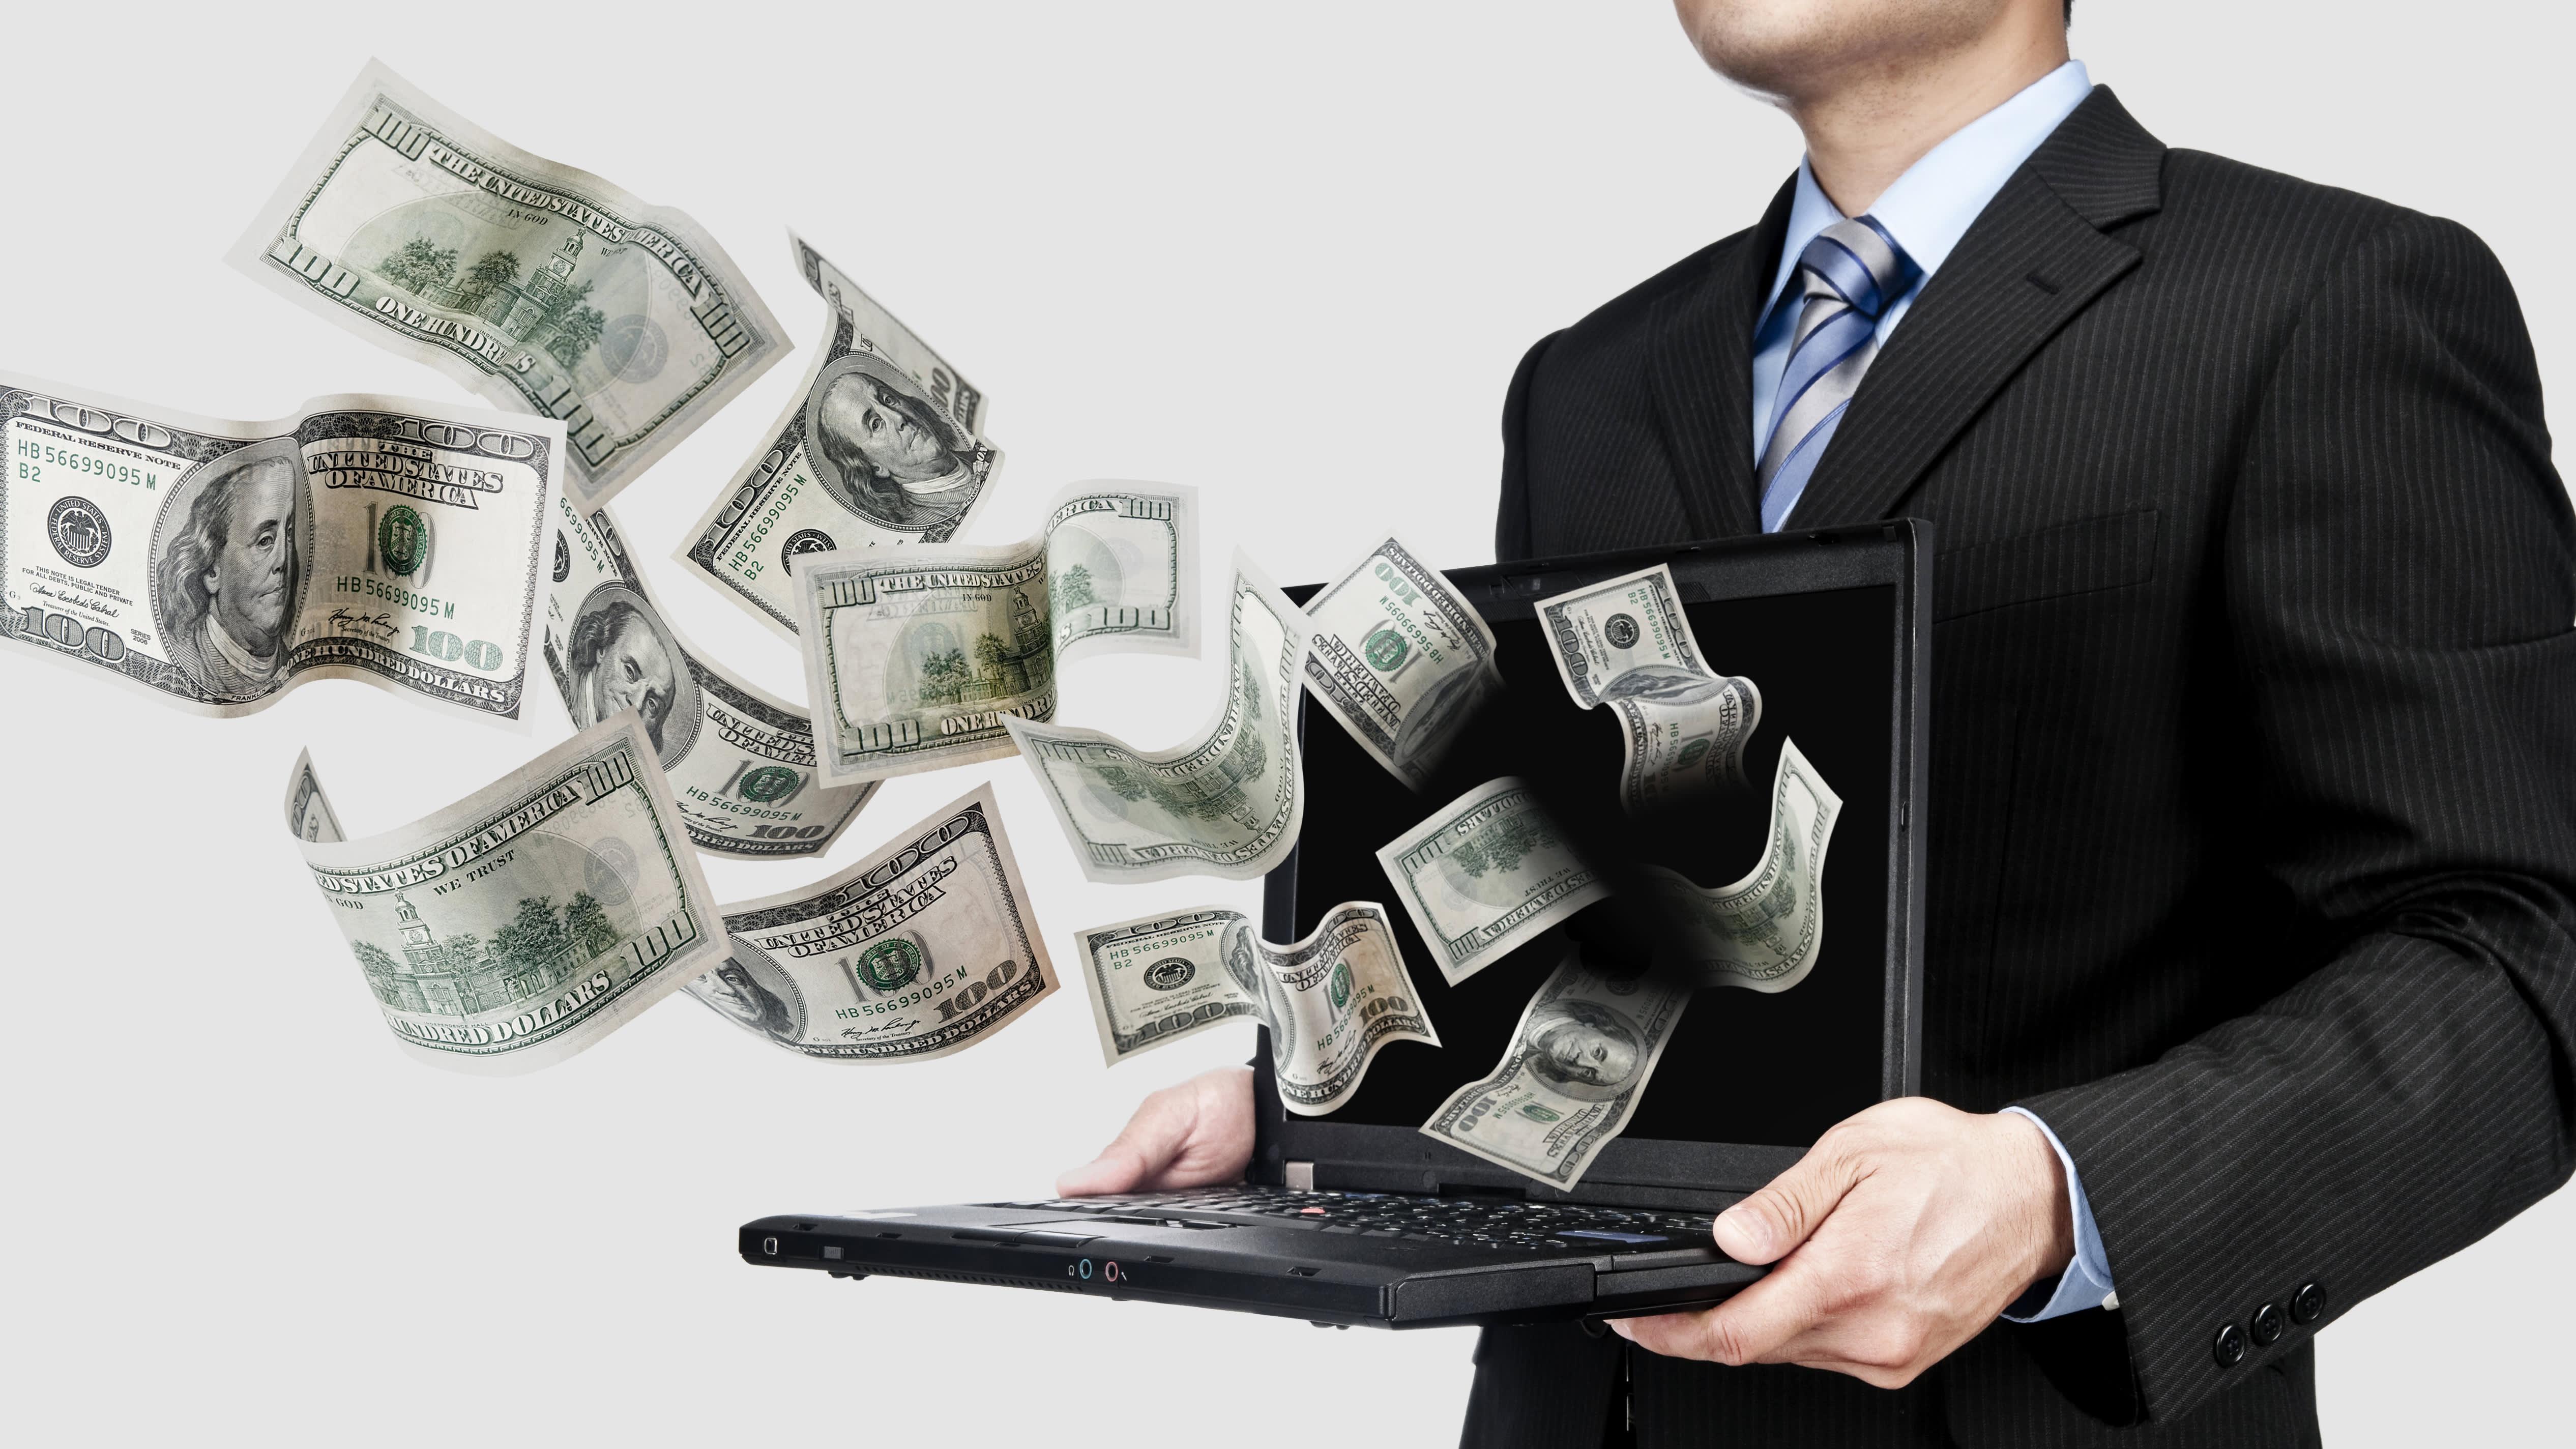 Payday advance loans san bernardino image 5